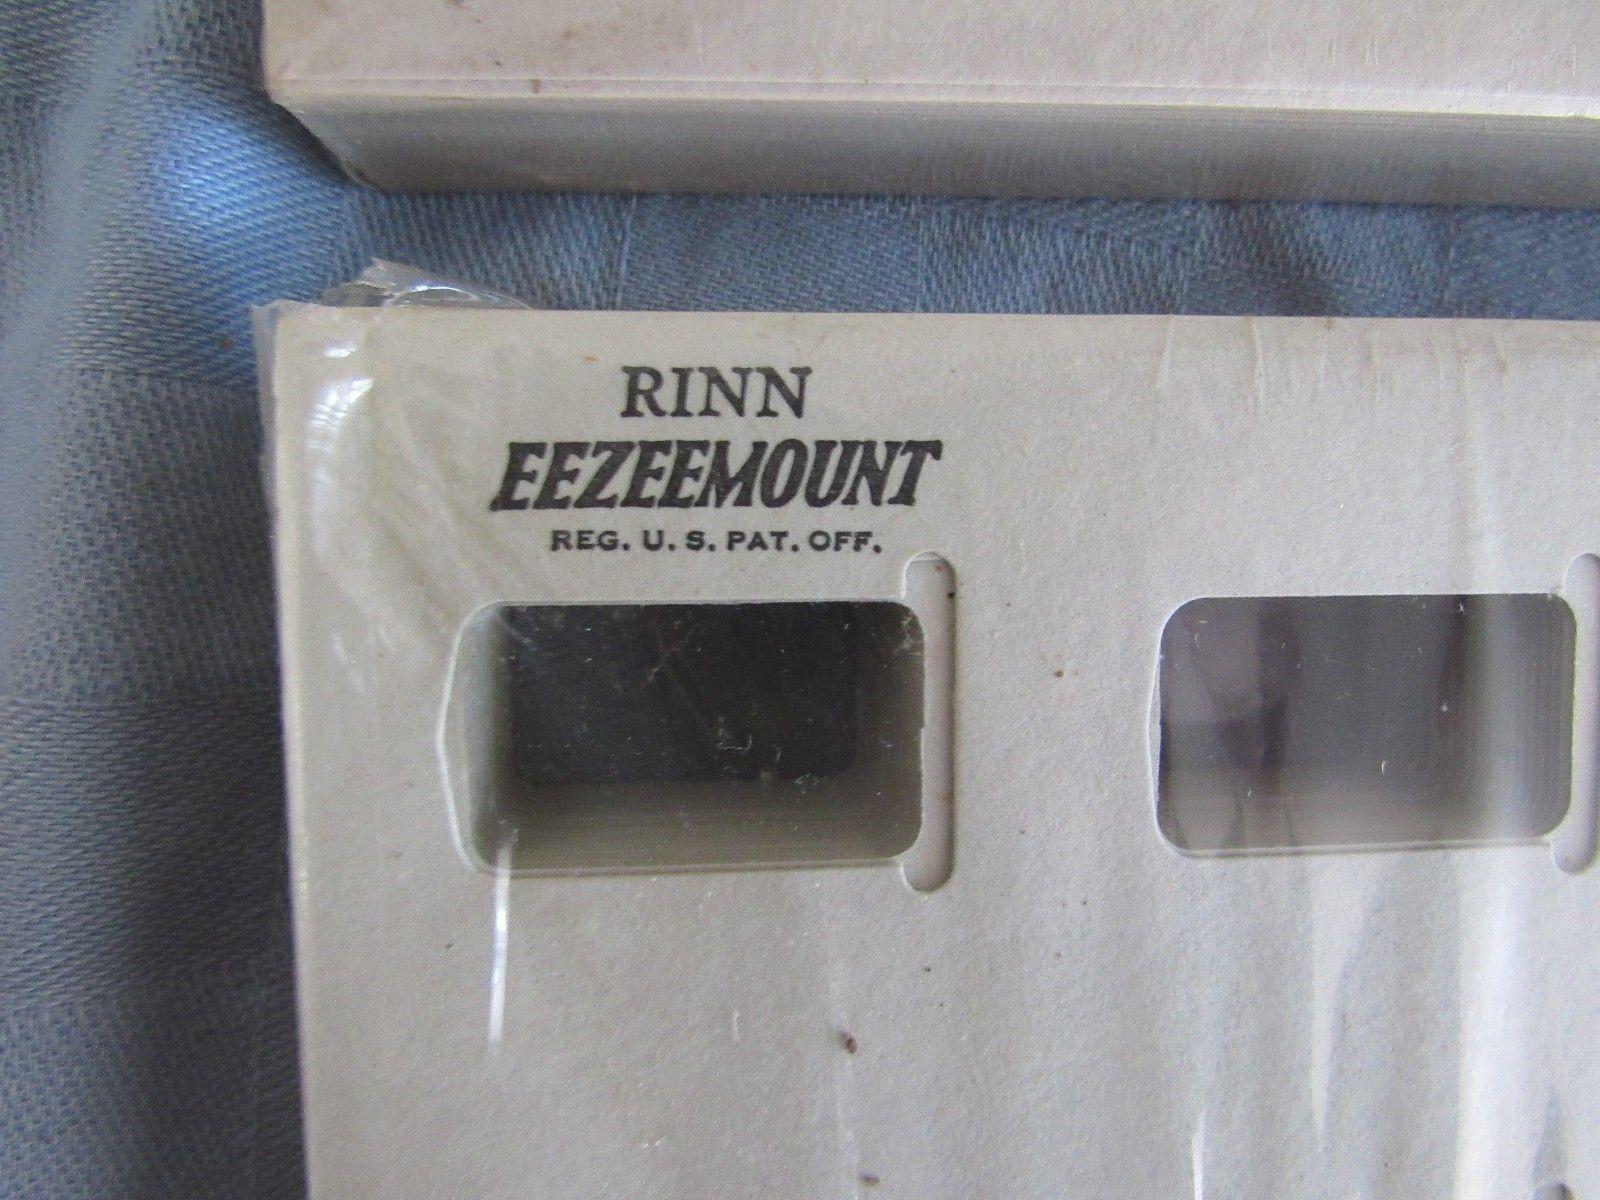 74 Dental X-RAY Holders Mounts Eezeemount Rinn Stock no 10-137